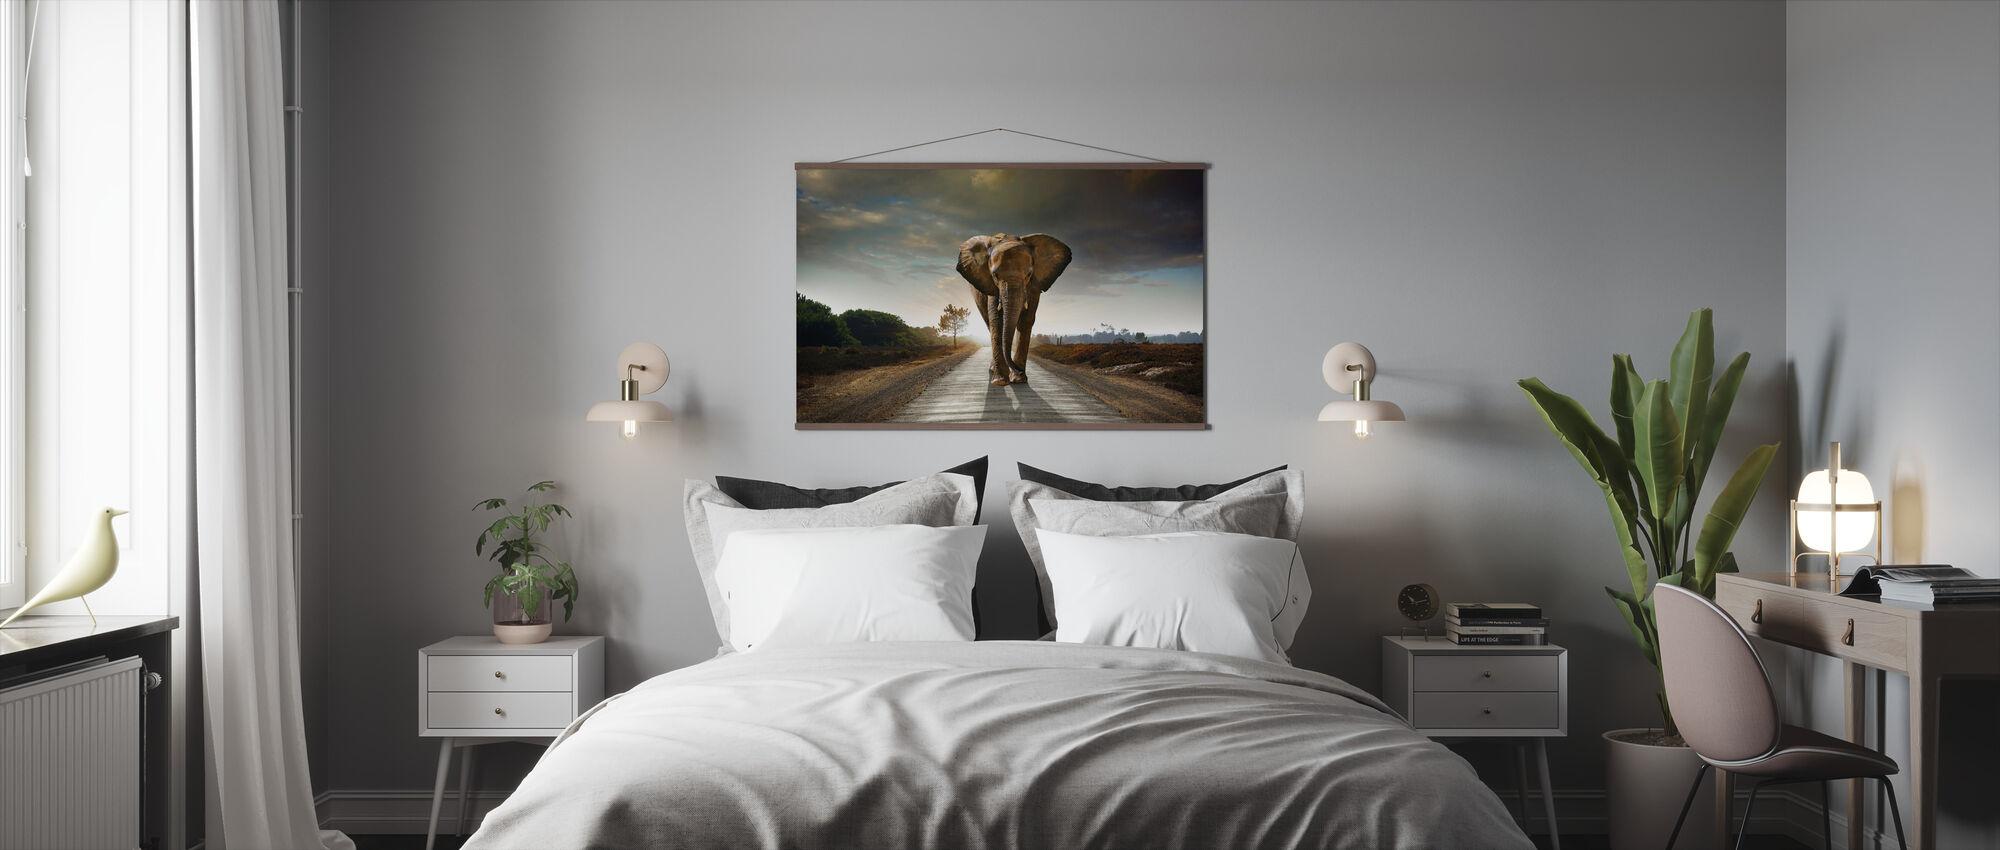 Elephant Road - Plakat - Soverom